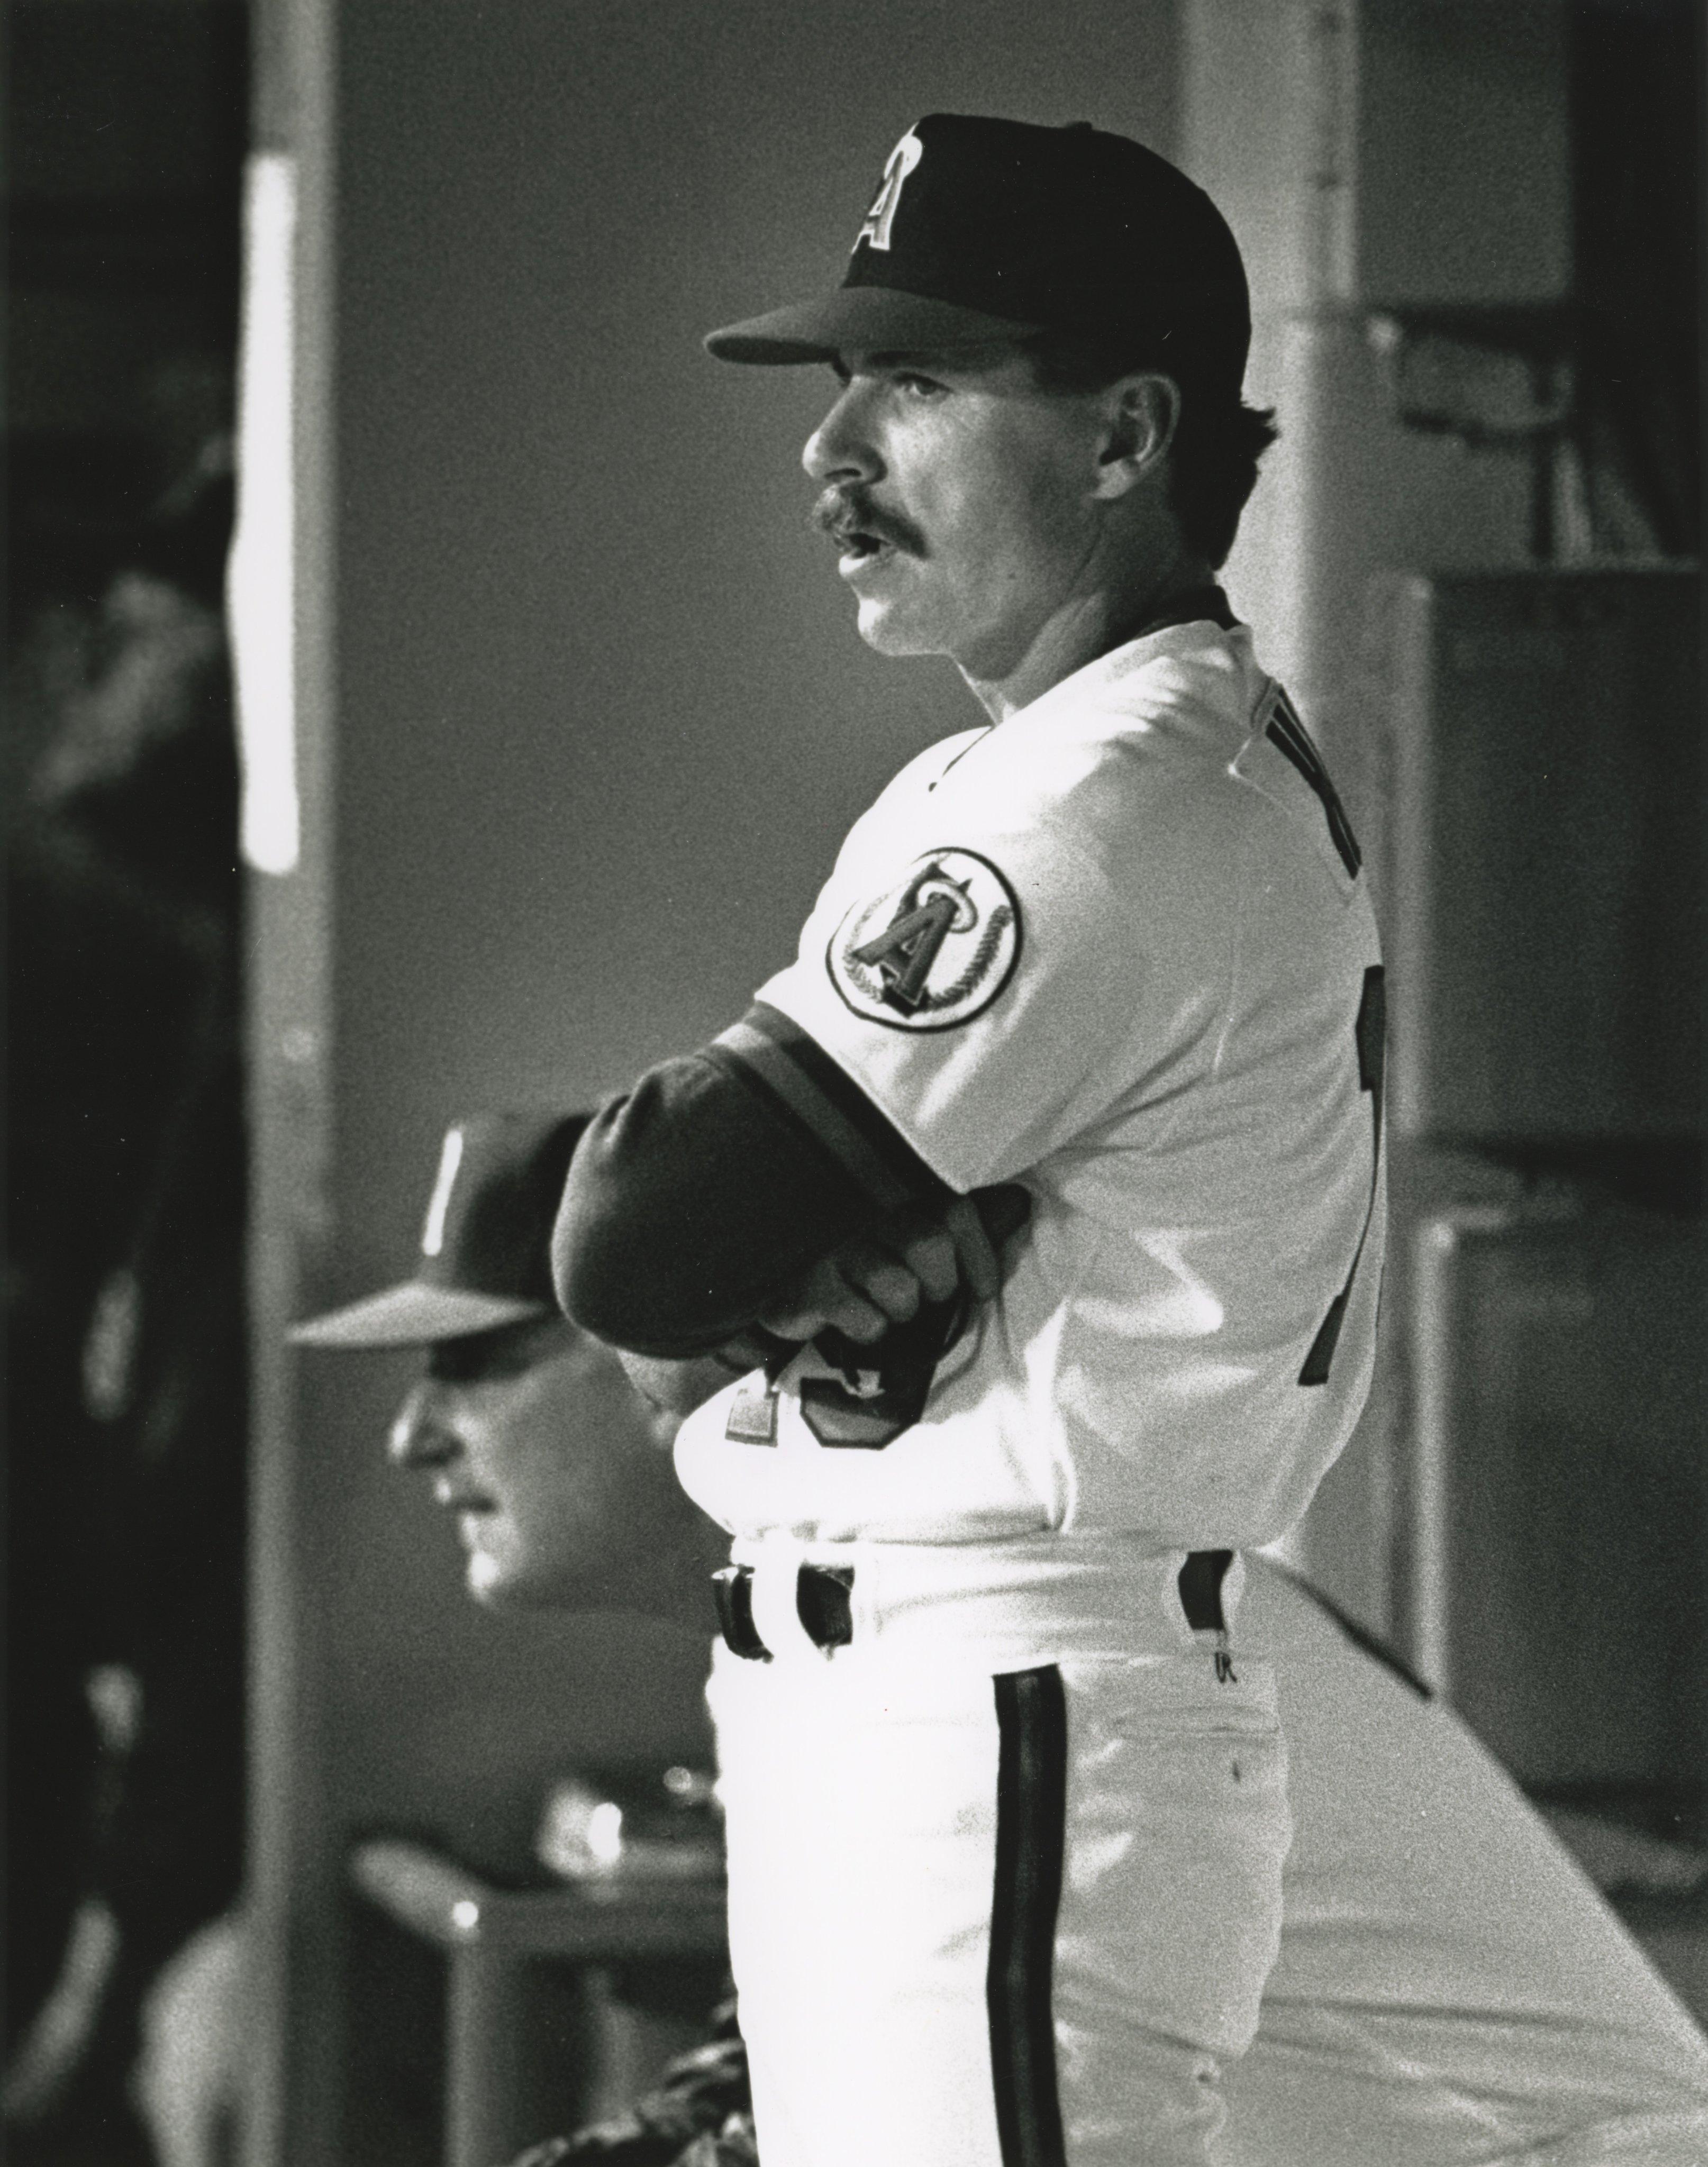 Angels coach Bruce Hines